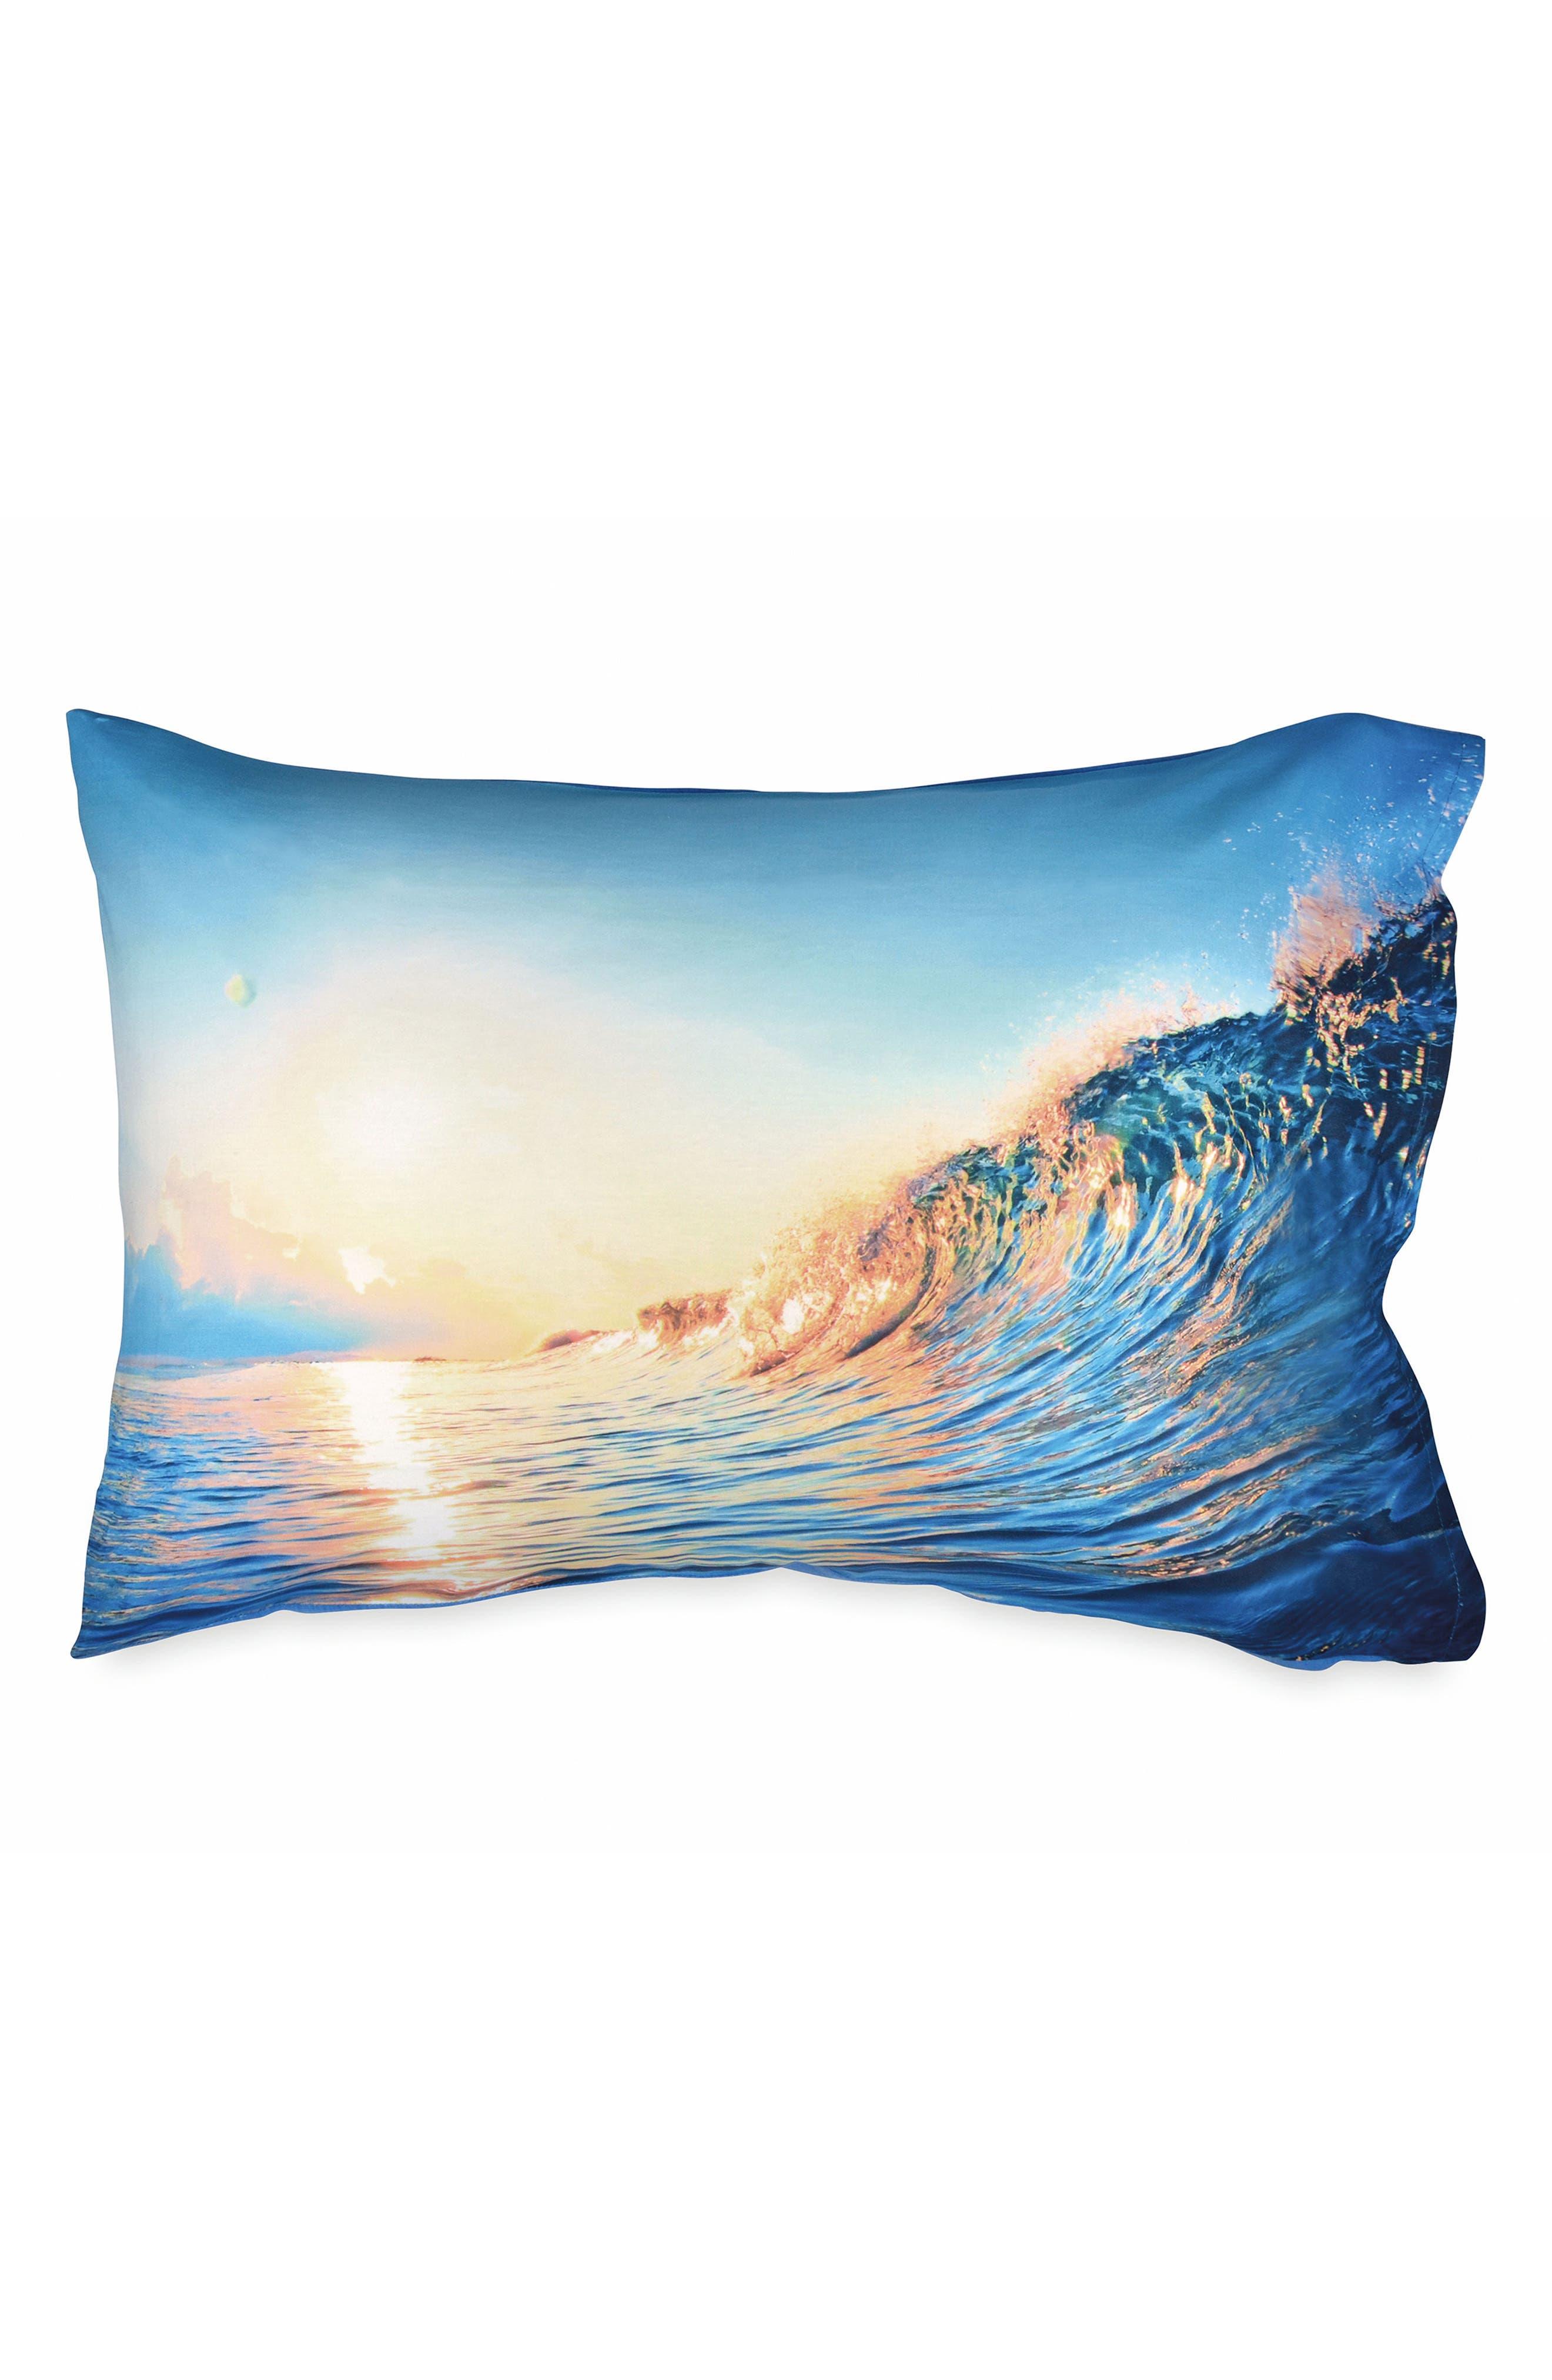 Wave Pillowcase,                             Main thumbnail 1, color,                             Aqua